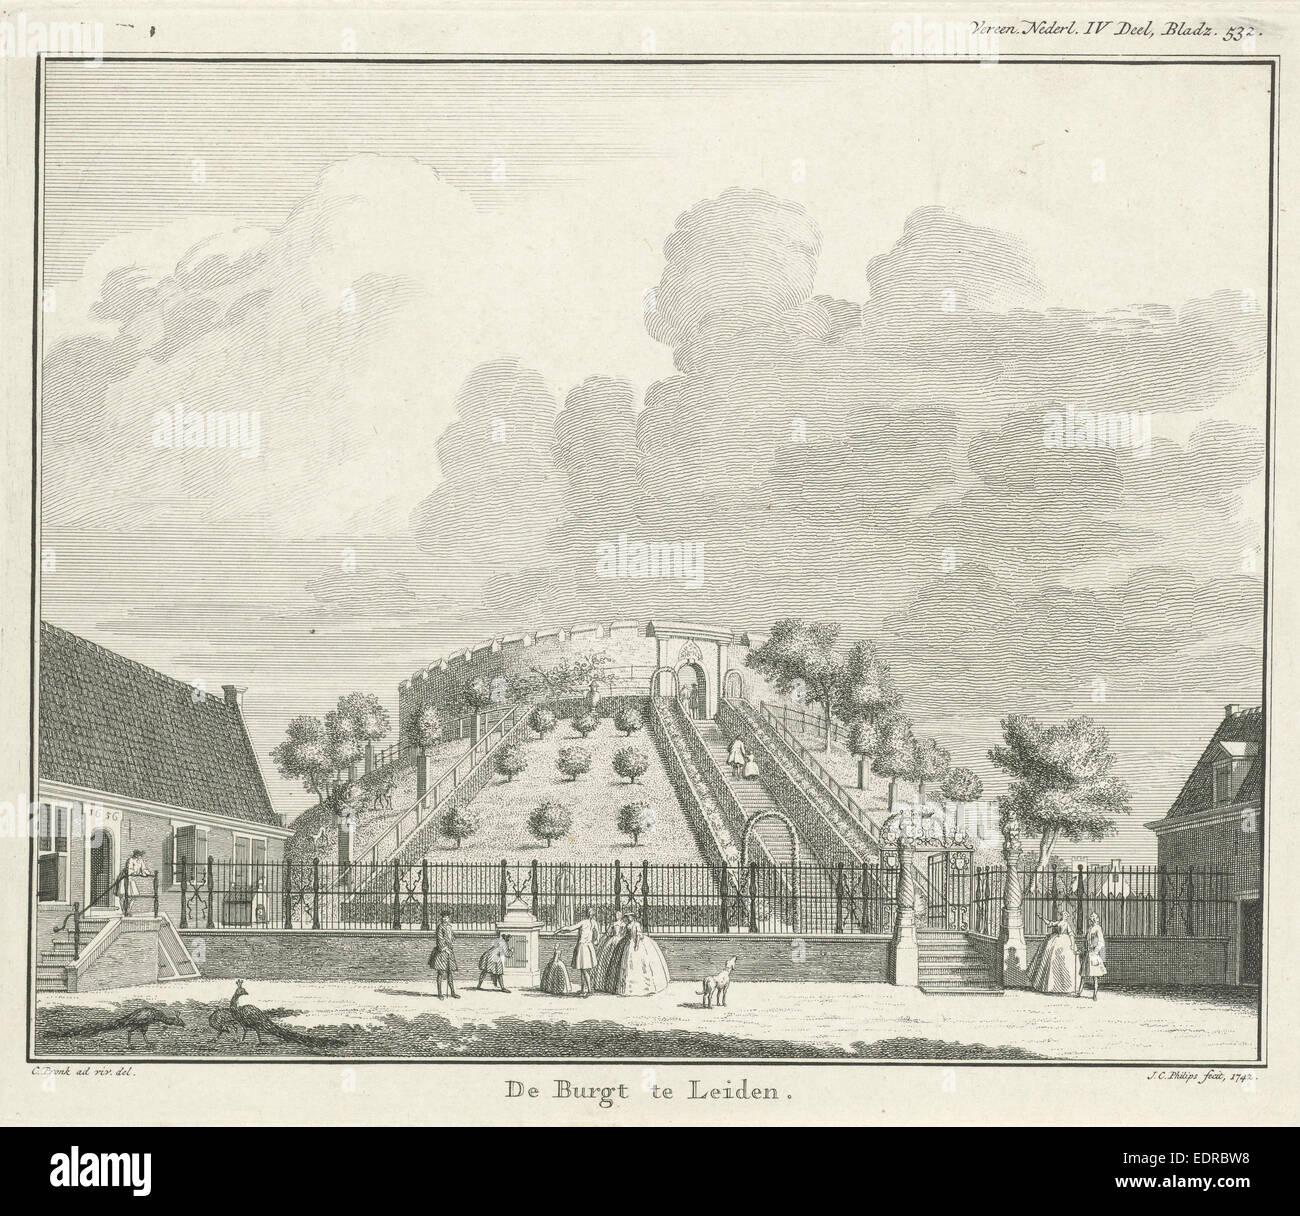 View of the castle of Leiden The Netherlands, Jan Caspar Philips, 1742 - Stock Image